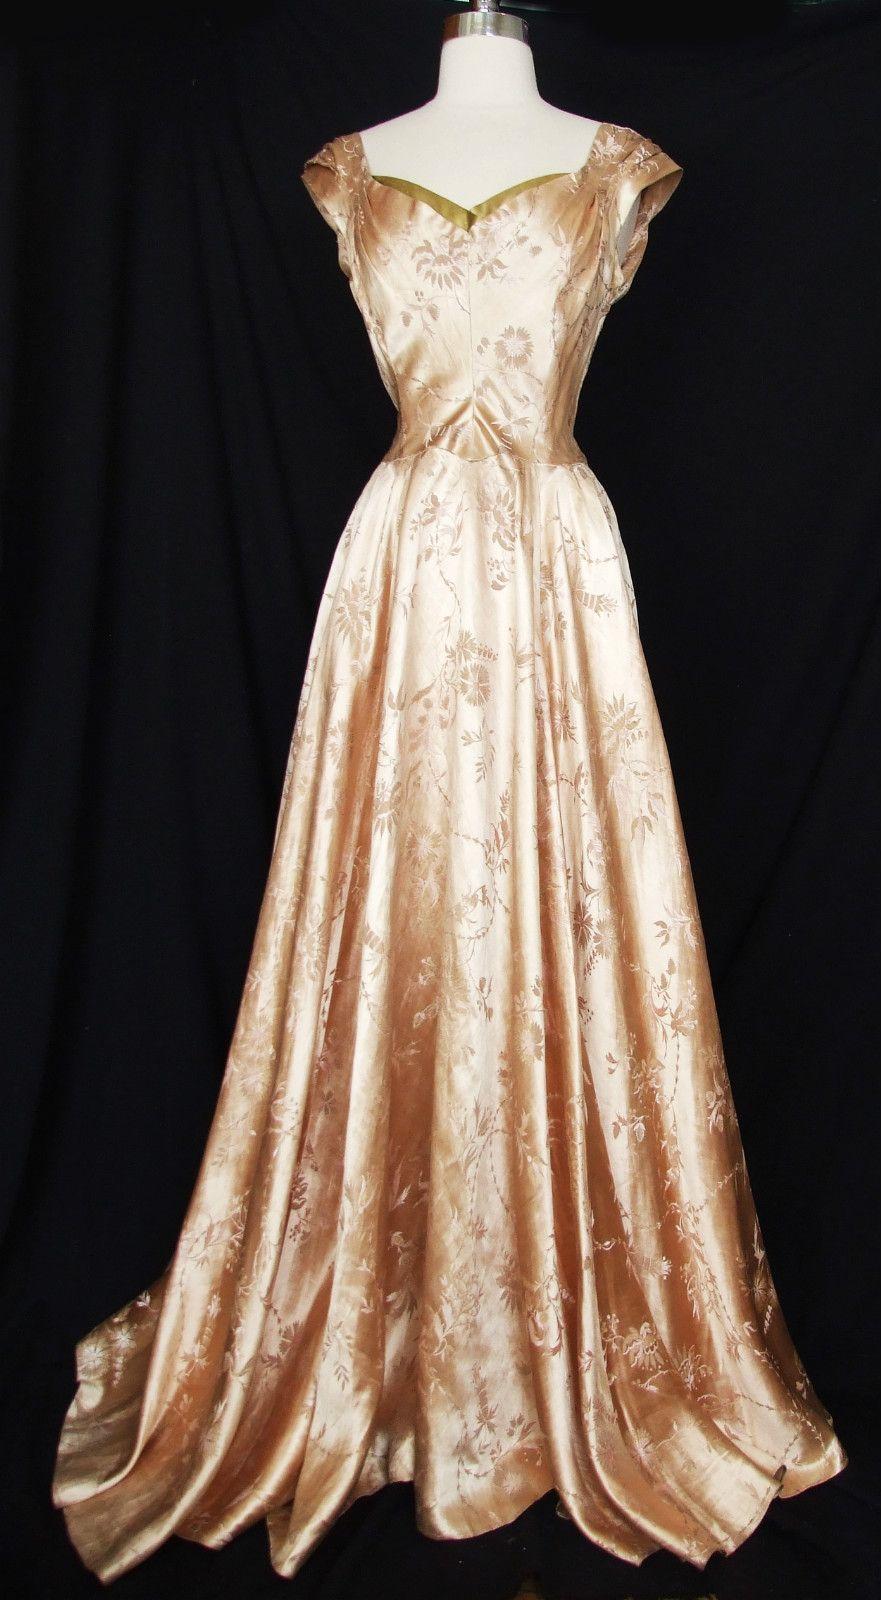 Vtg s s silk satin brocade evening gown party dress wwii era